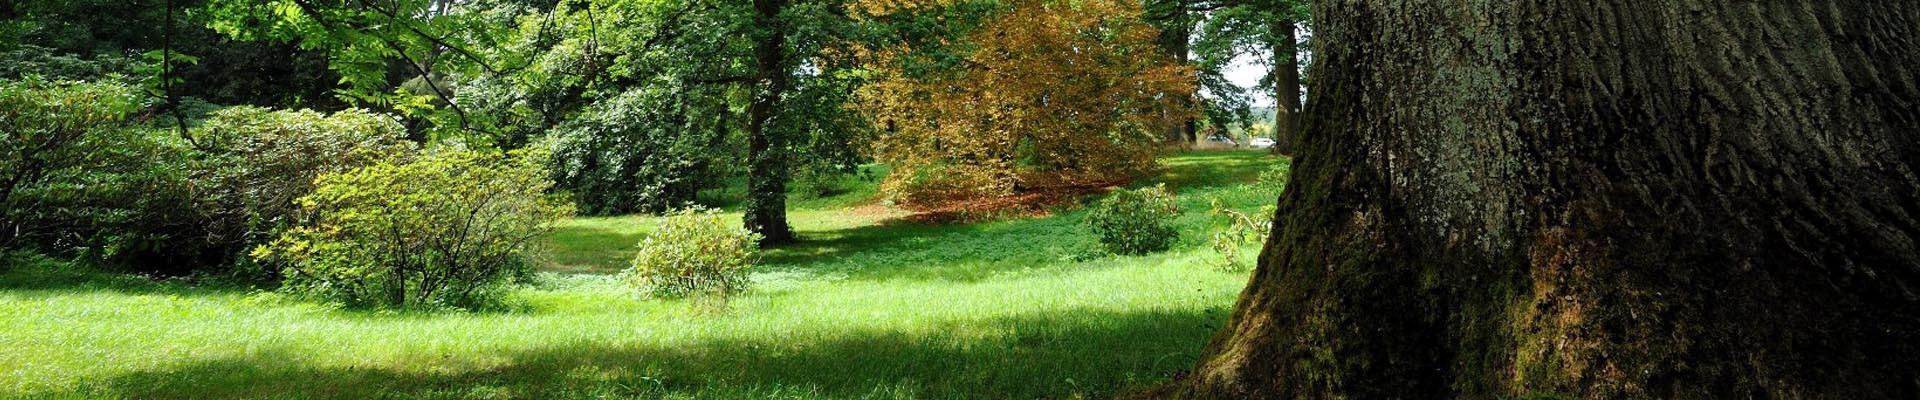 Arboretum of Chèvreloup